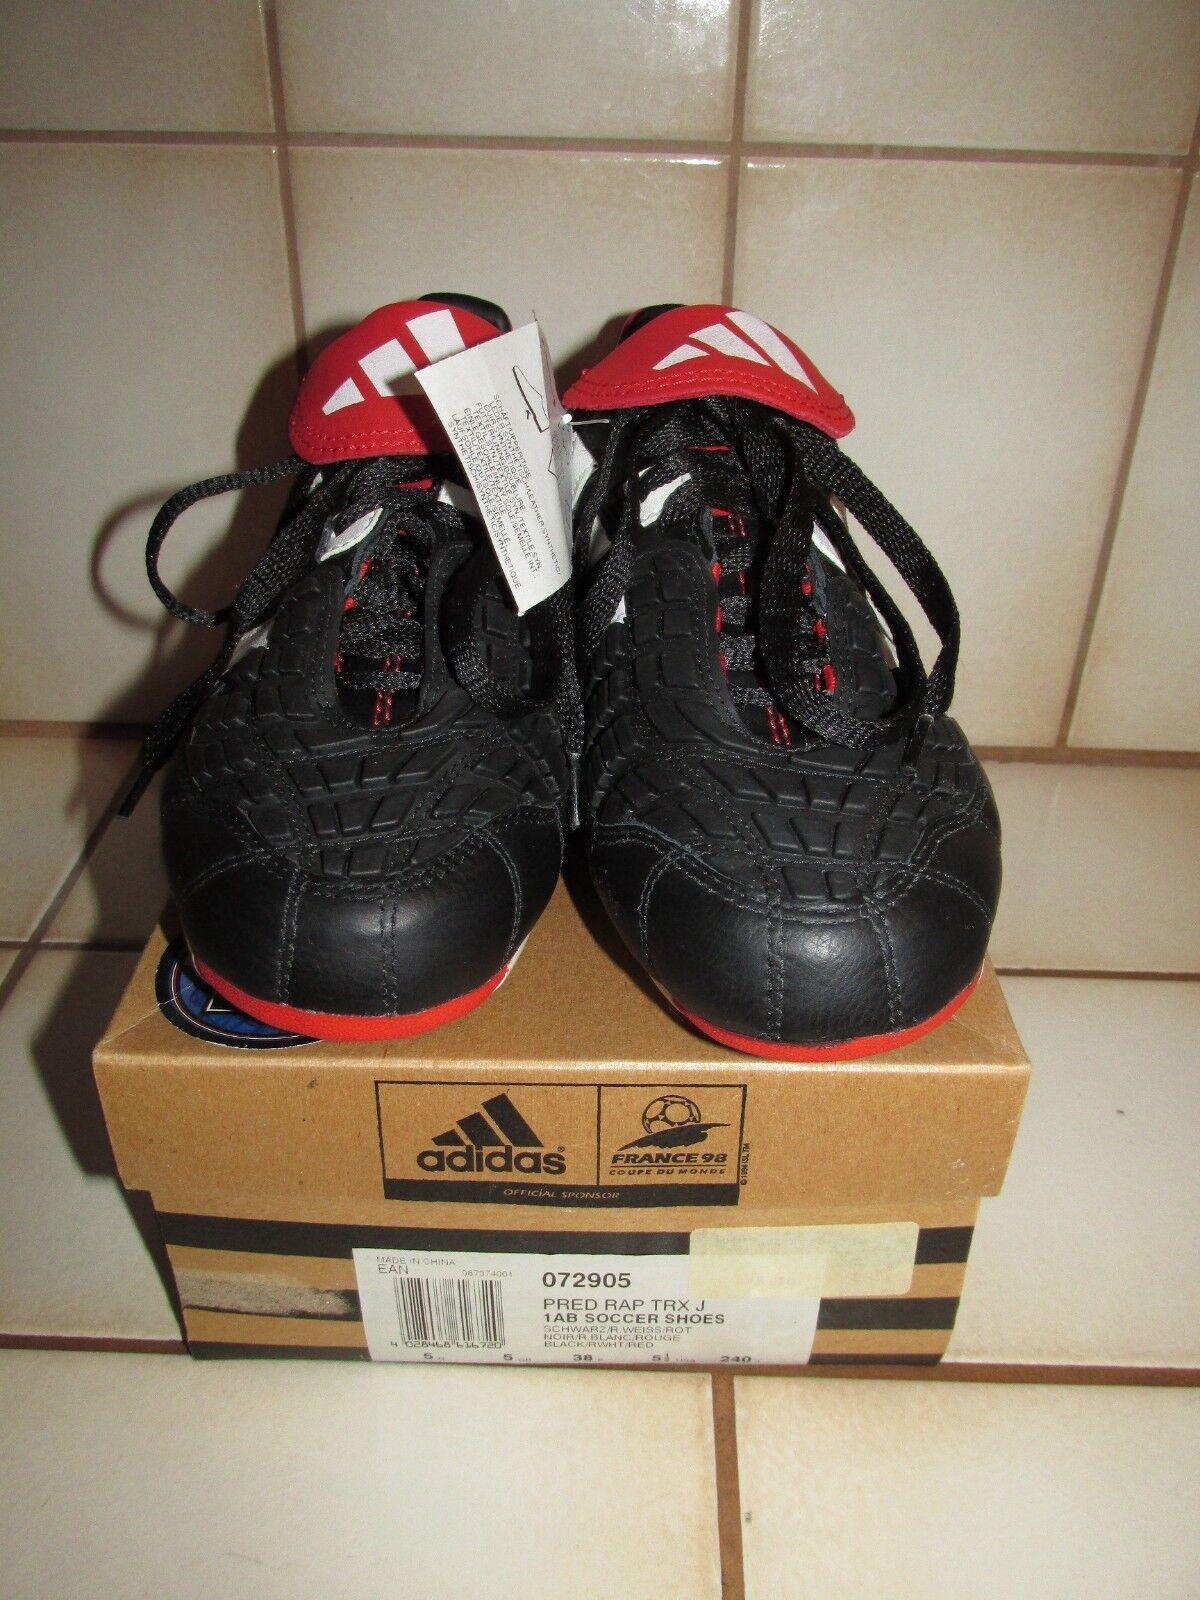 De 2001  raras  adidas projo rap TRX Echt Leder botas de fútbol, talla 38 uk 5 nuevo